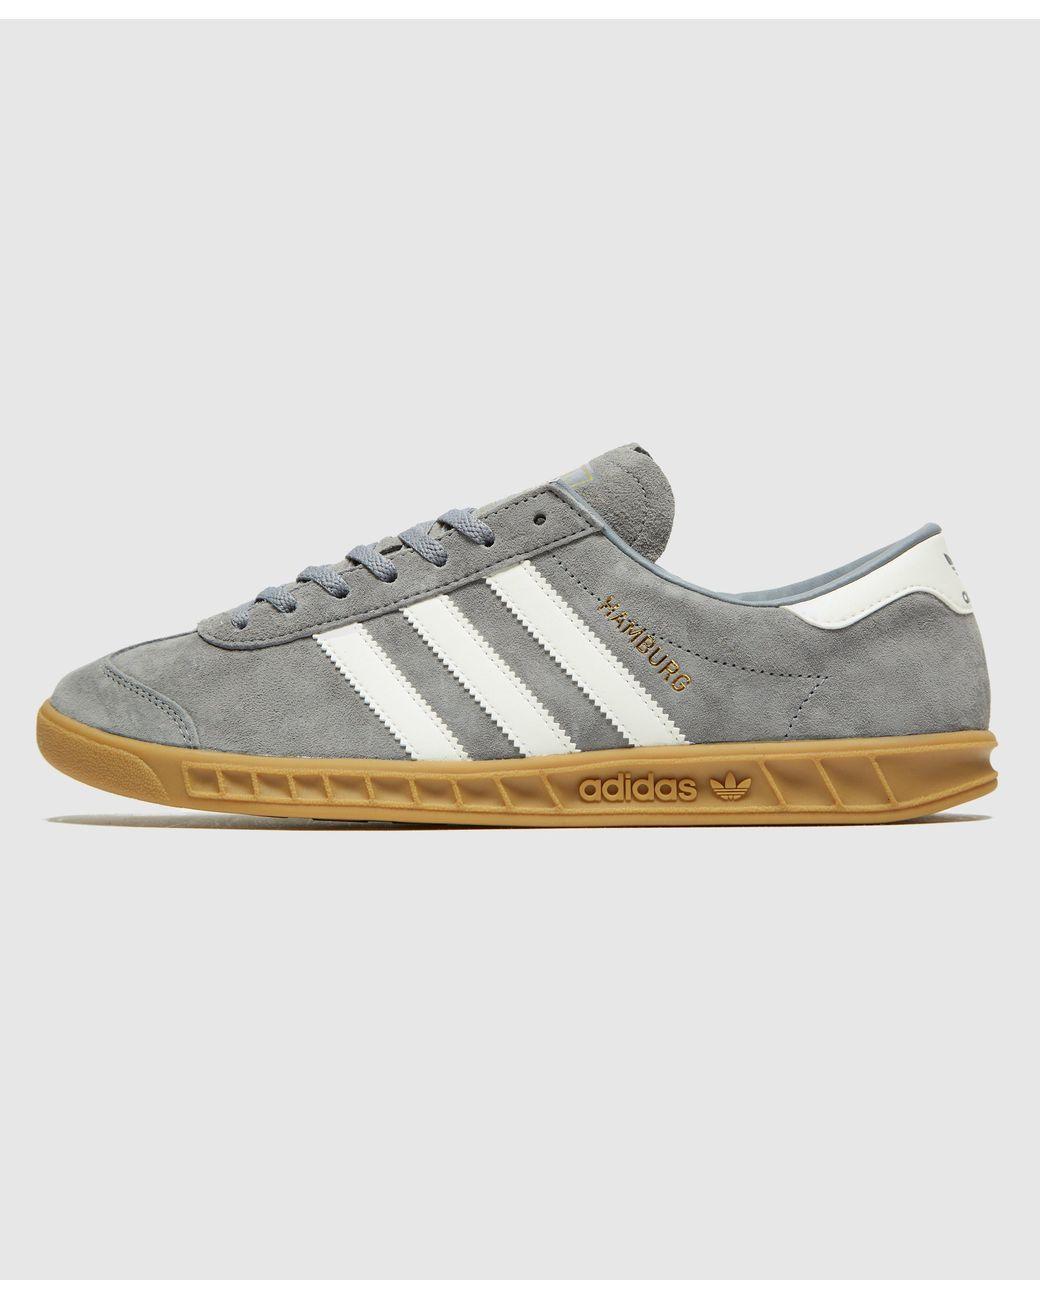 adidas Originals Leather Hamburg in Grey (Gray) for Men - Lyst